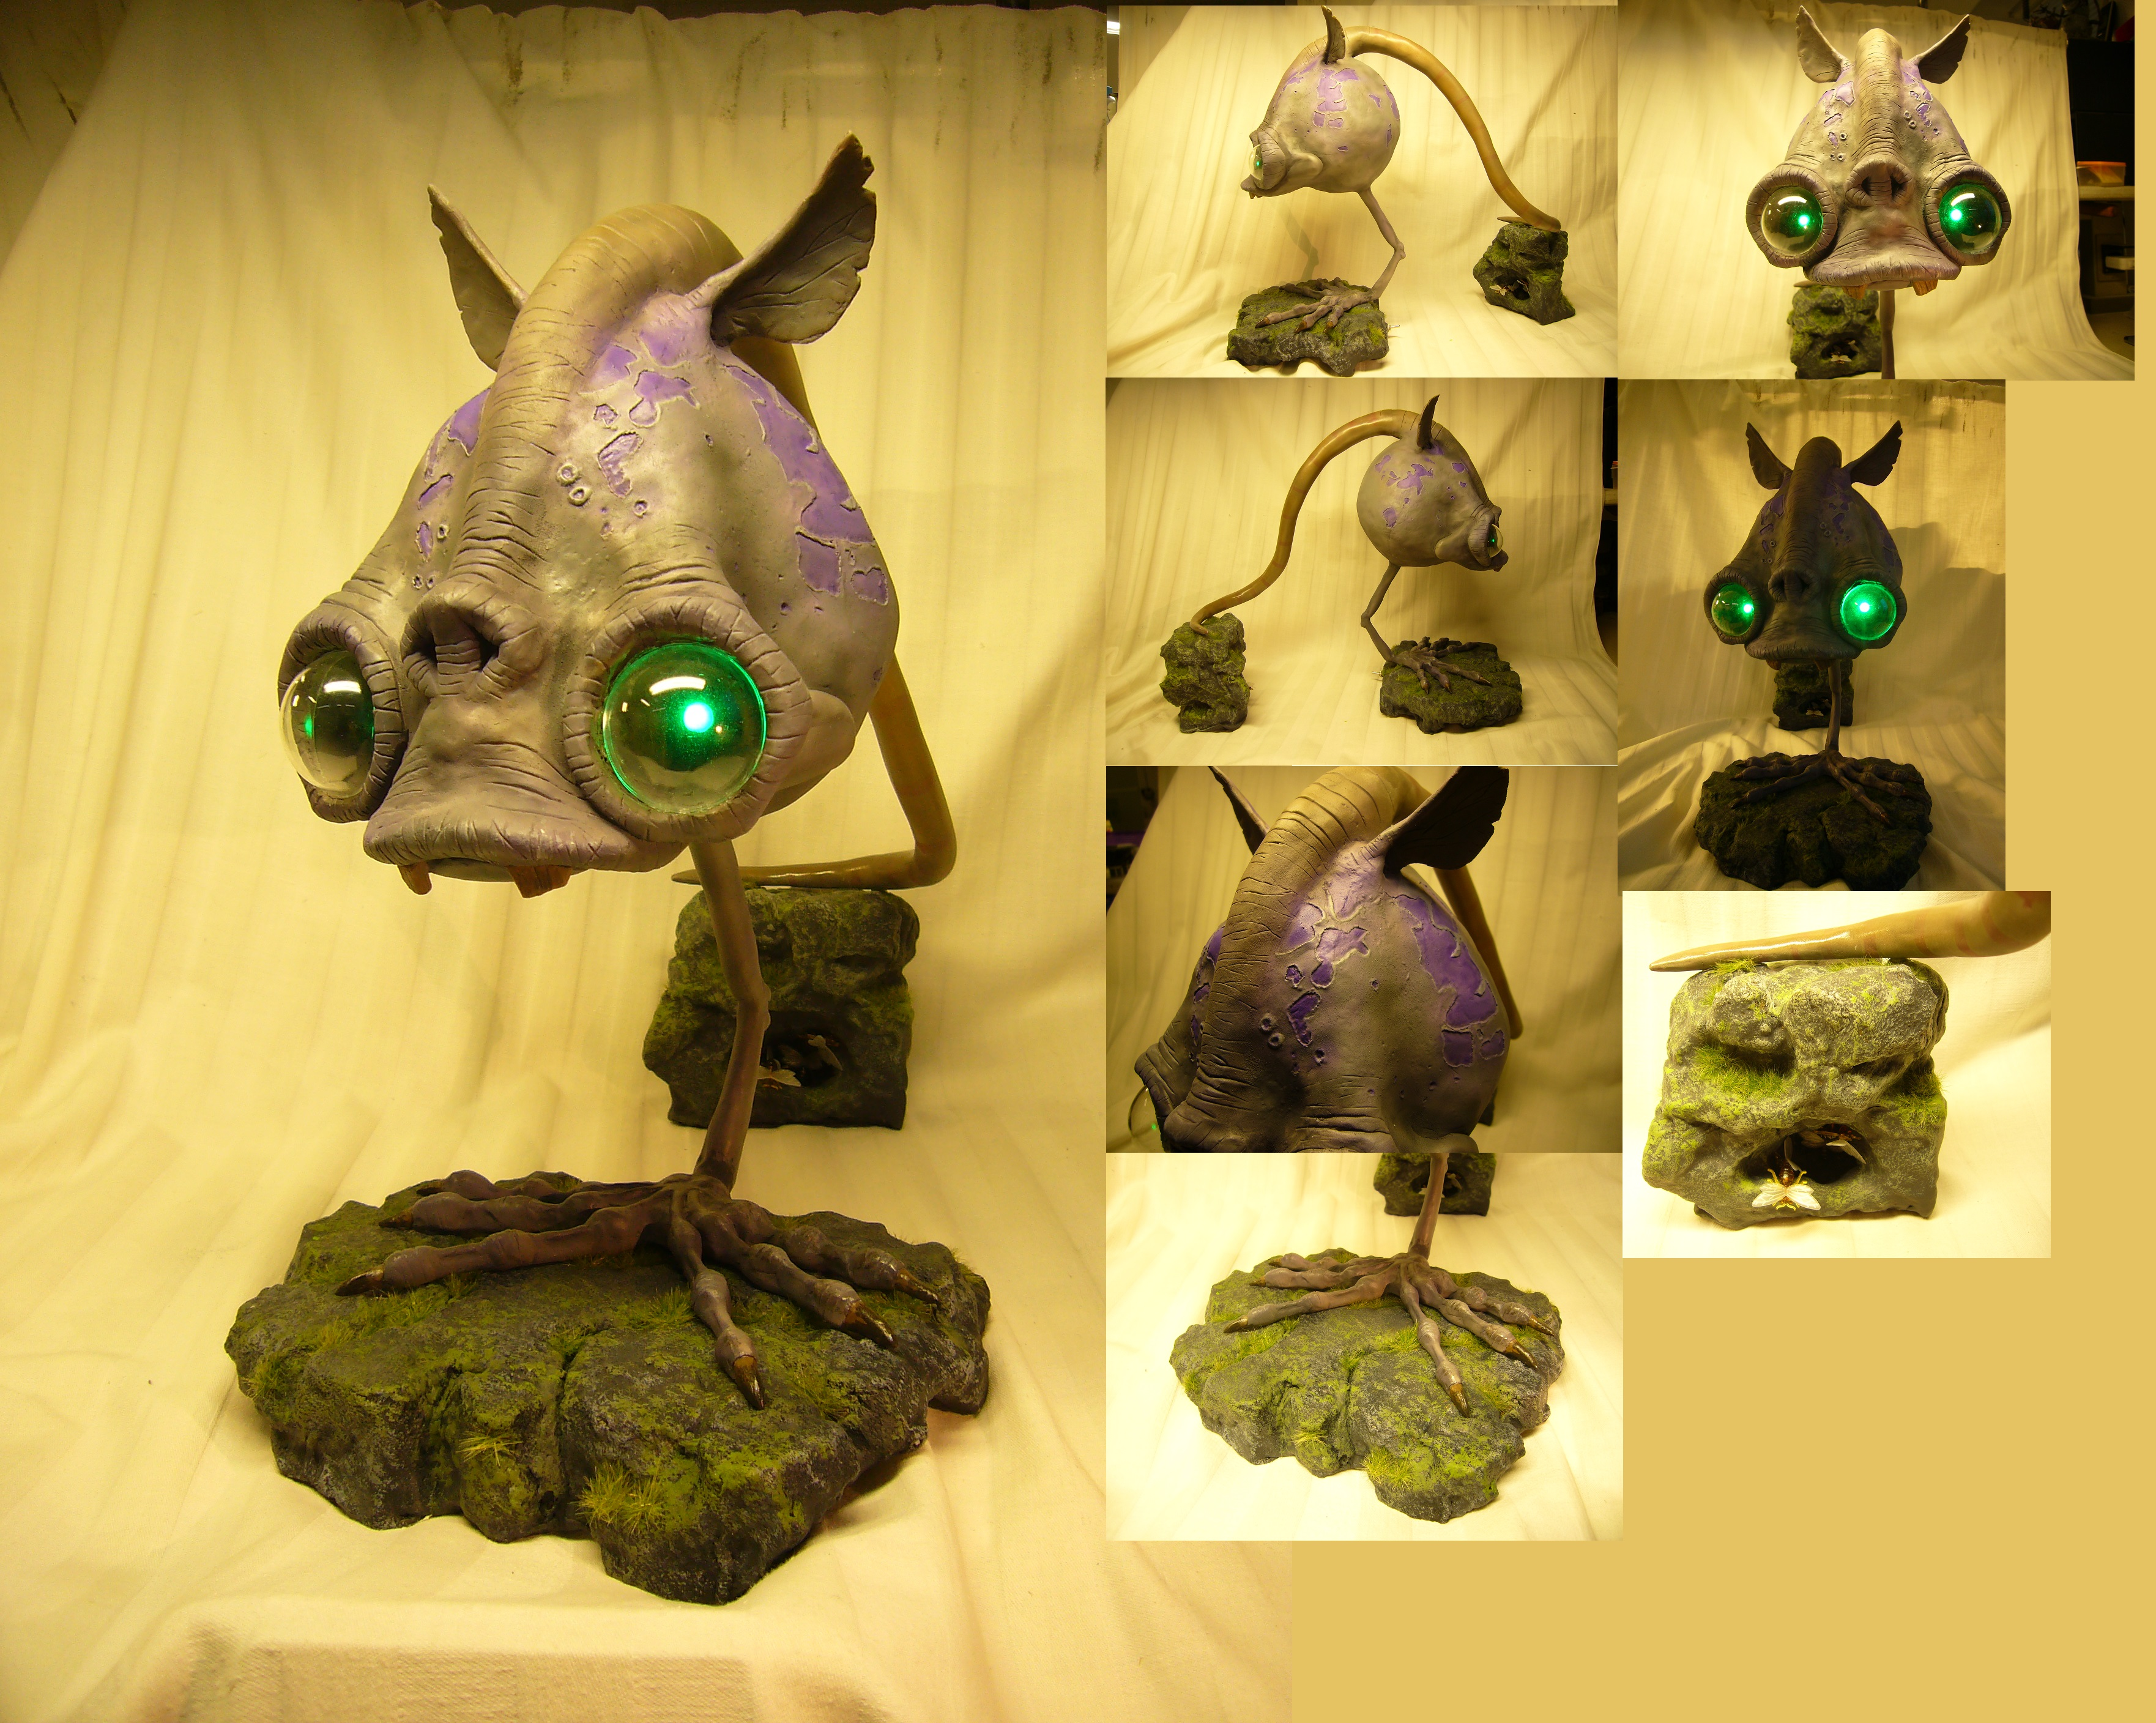 Oddworld: Munch's Oddysee - Rat replica by Corroder666